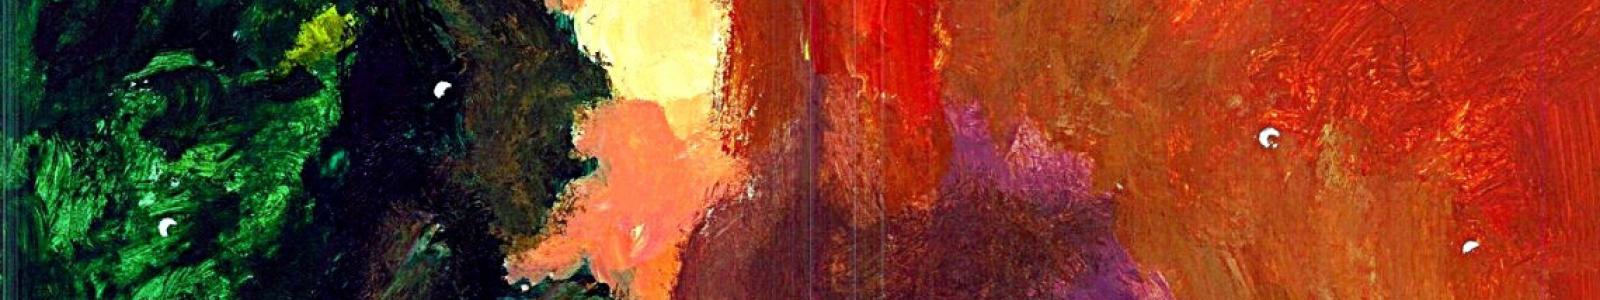 Gallery Painter Nataliia Ivanova